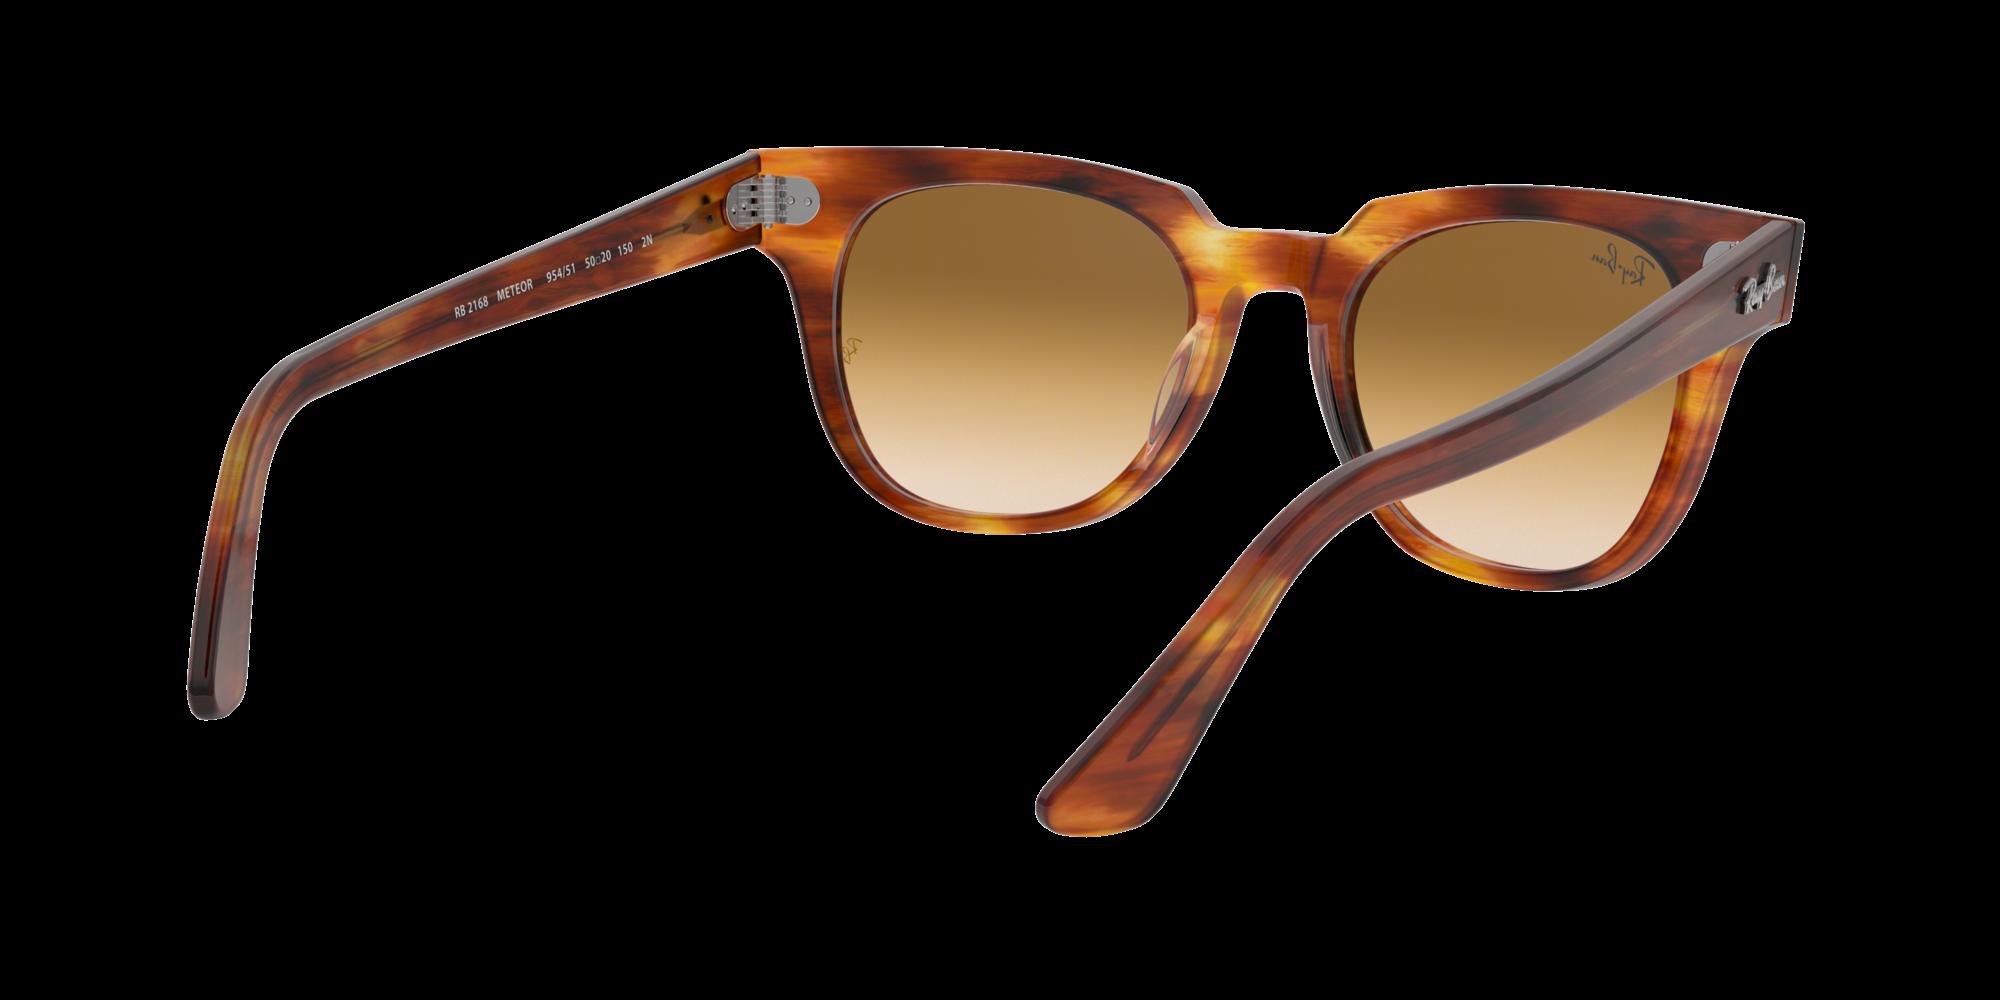 bcb2ffcbf3 Sunglasses Ray-Ban Meteor Tortoise RB2168 954 51 50-20 Medium Gradient